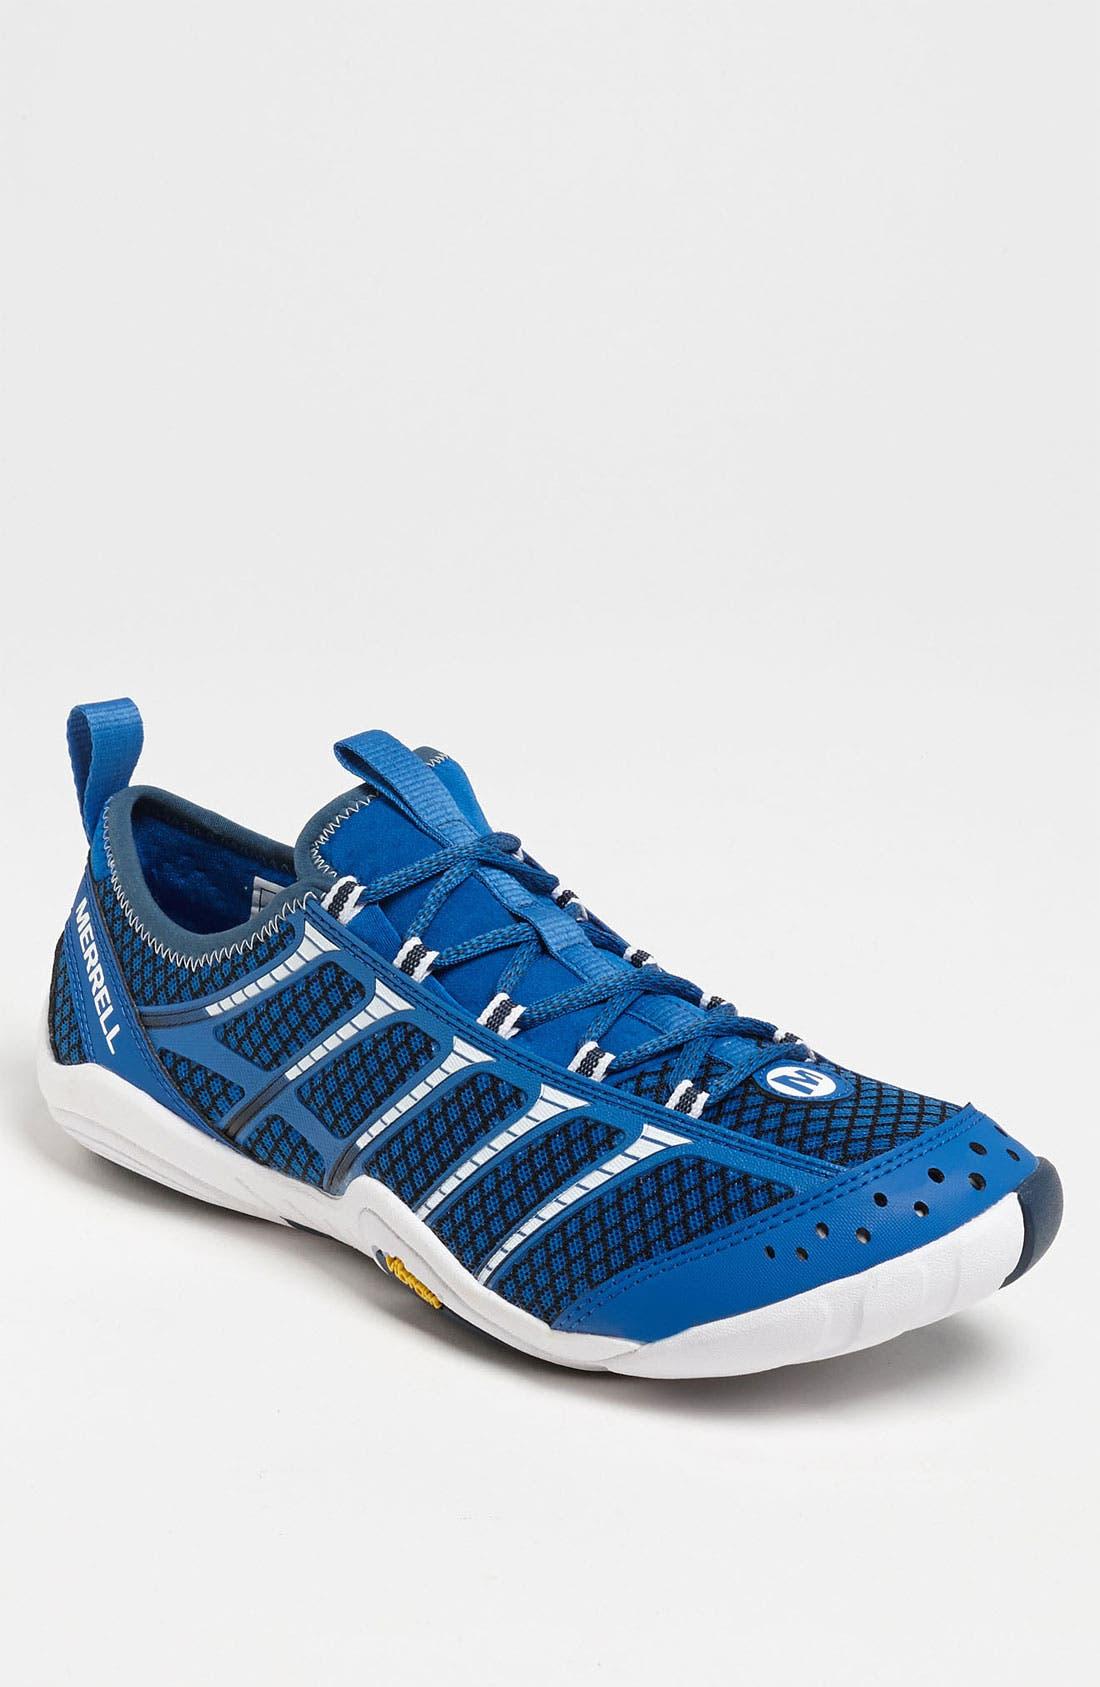 Alternate Image 1 Selected - Merrell 'Torrent Glove' Water Shoe (Men)